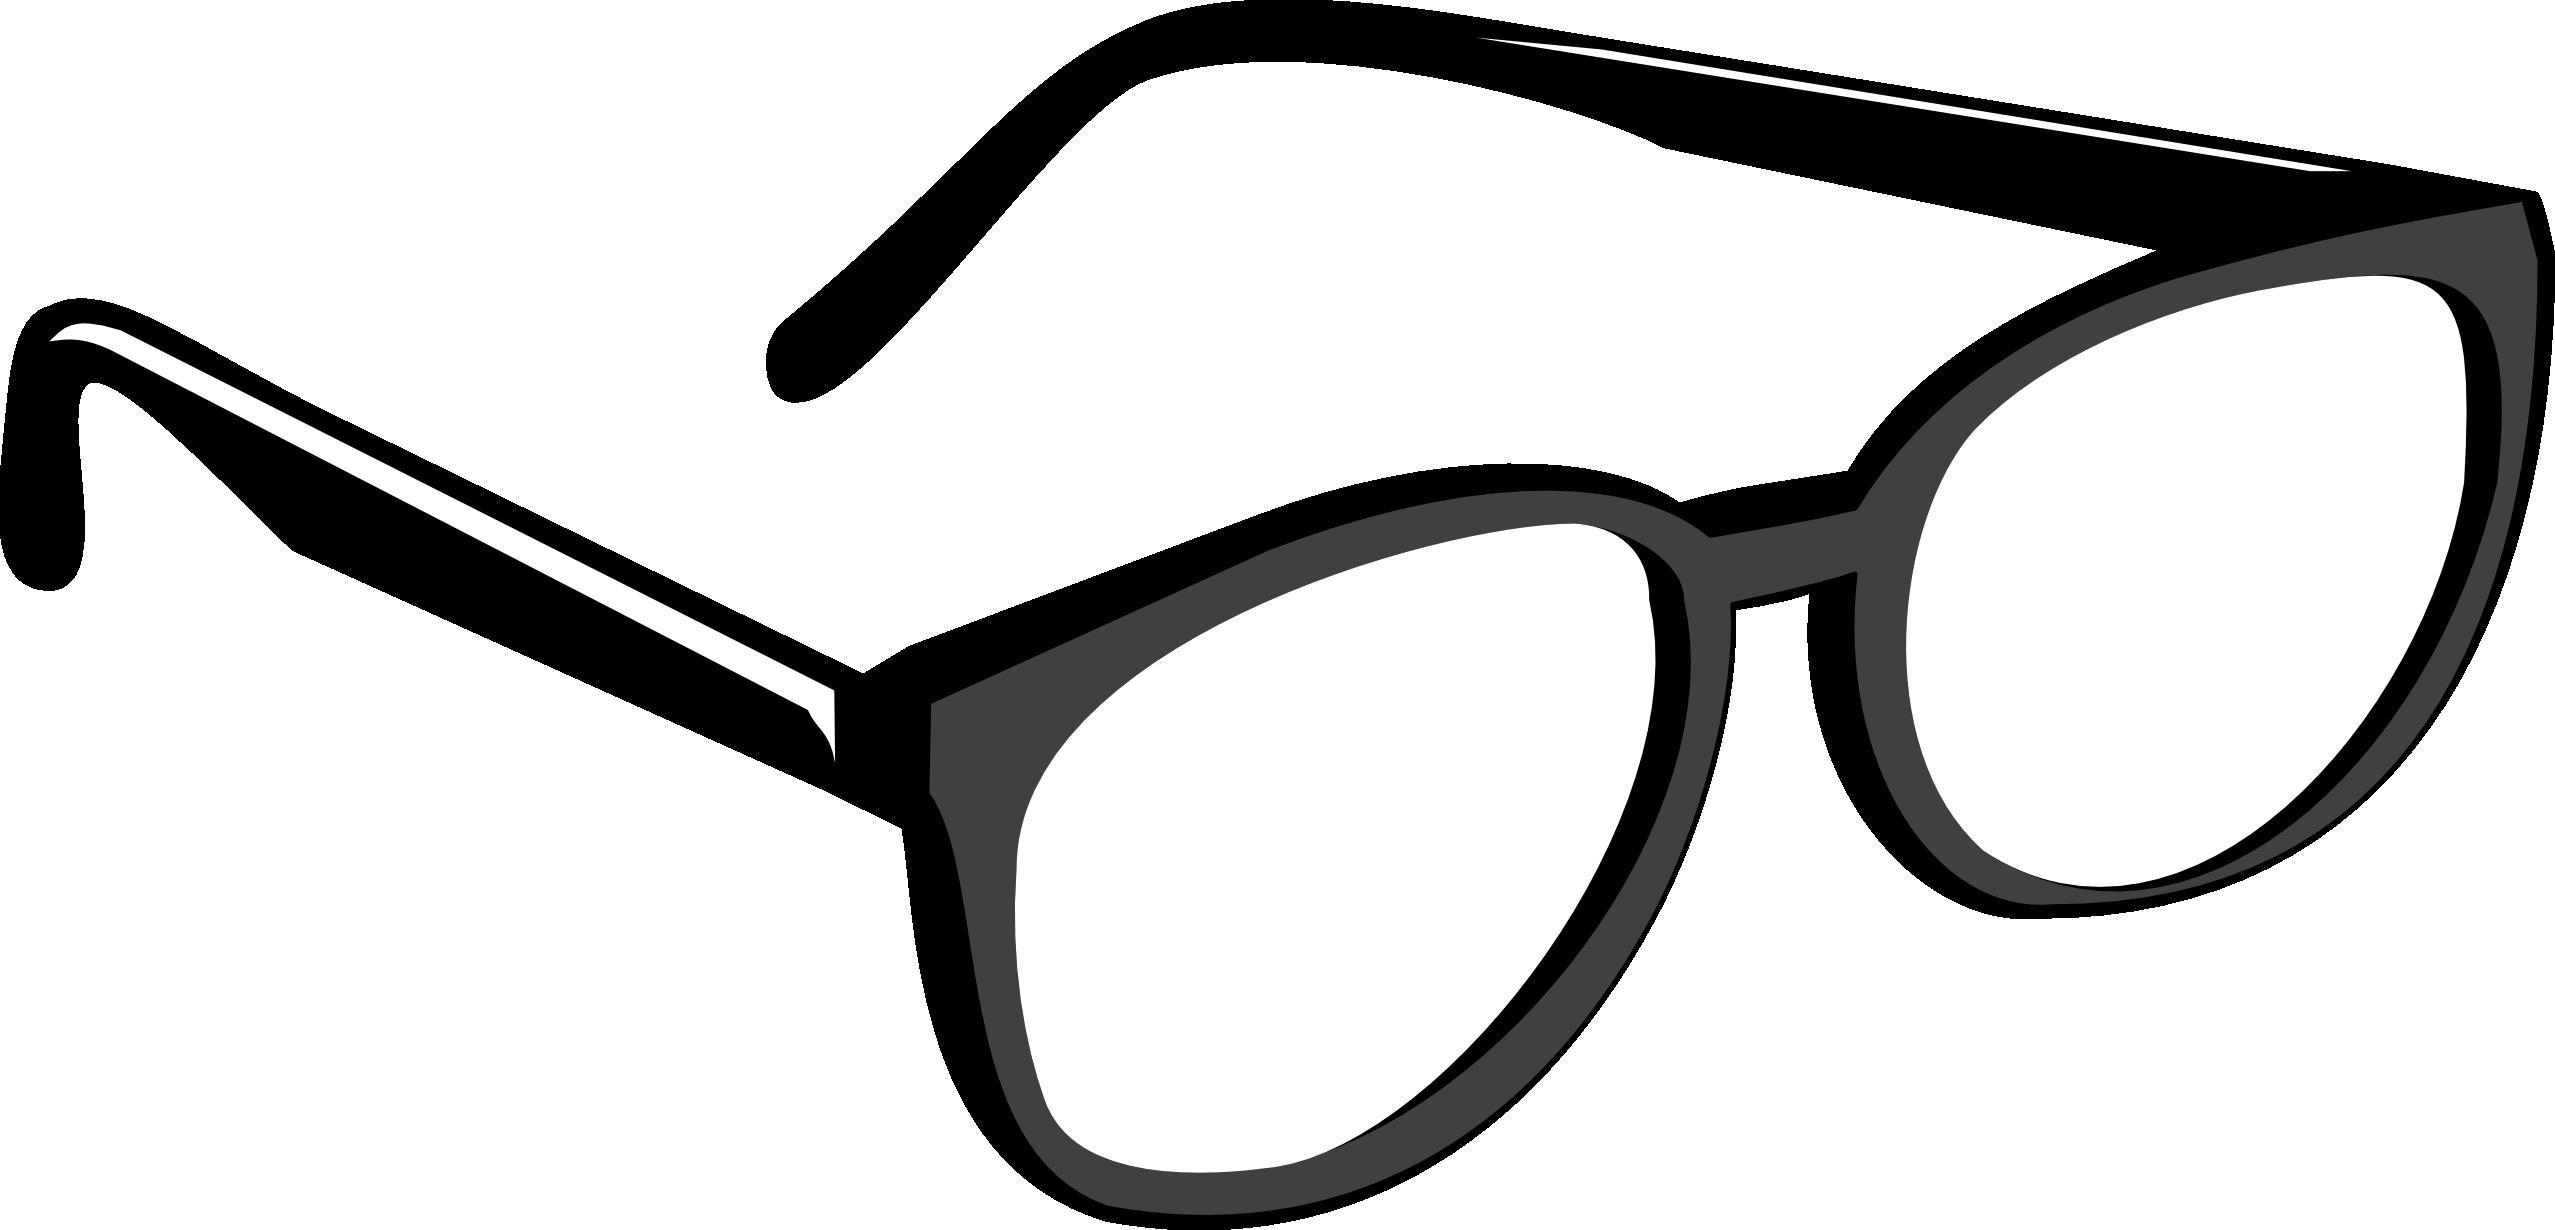 2555x1230 Drawn Goggles Clipart Transparent